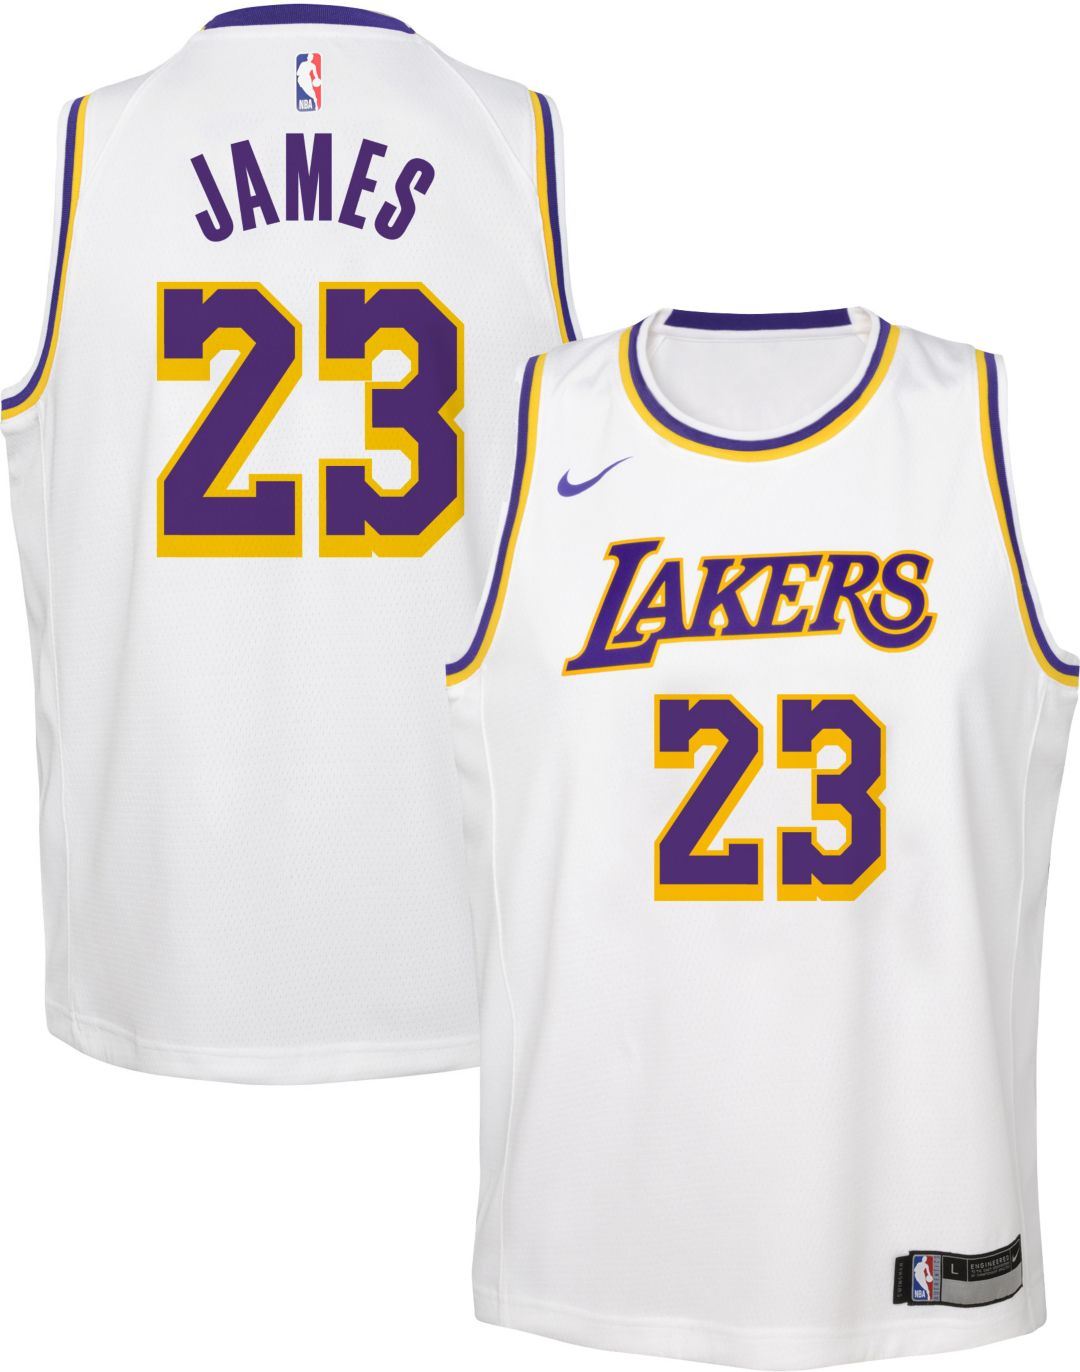 43f1184b86e7 Nike Youth Los Angeles Lakers LeBron James Dri-FIT White Swingman Jersey.  noImageFound. Previous